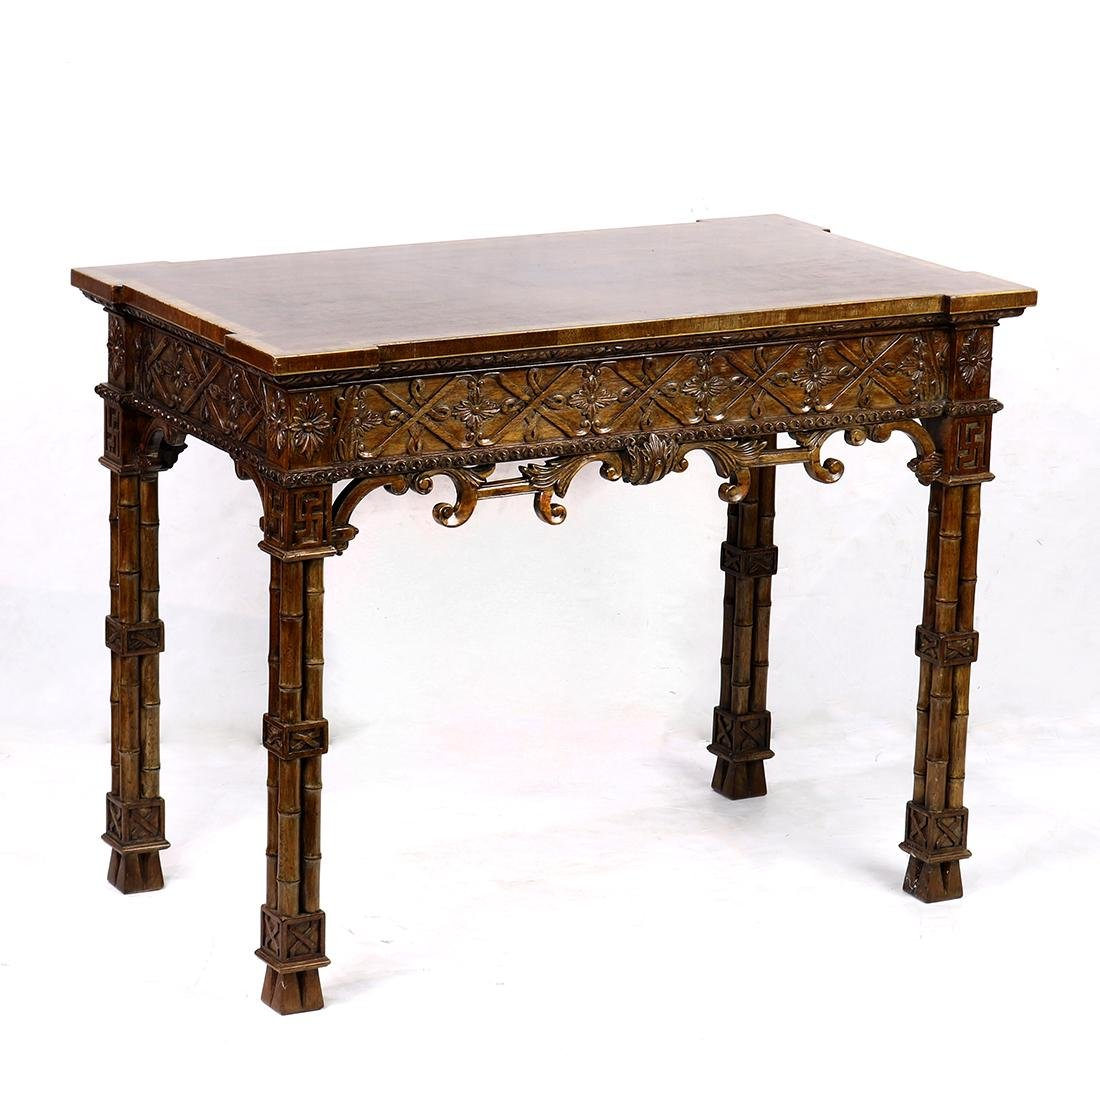 Italian Baroque style console table